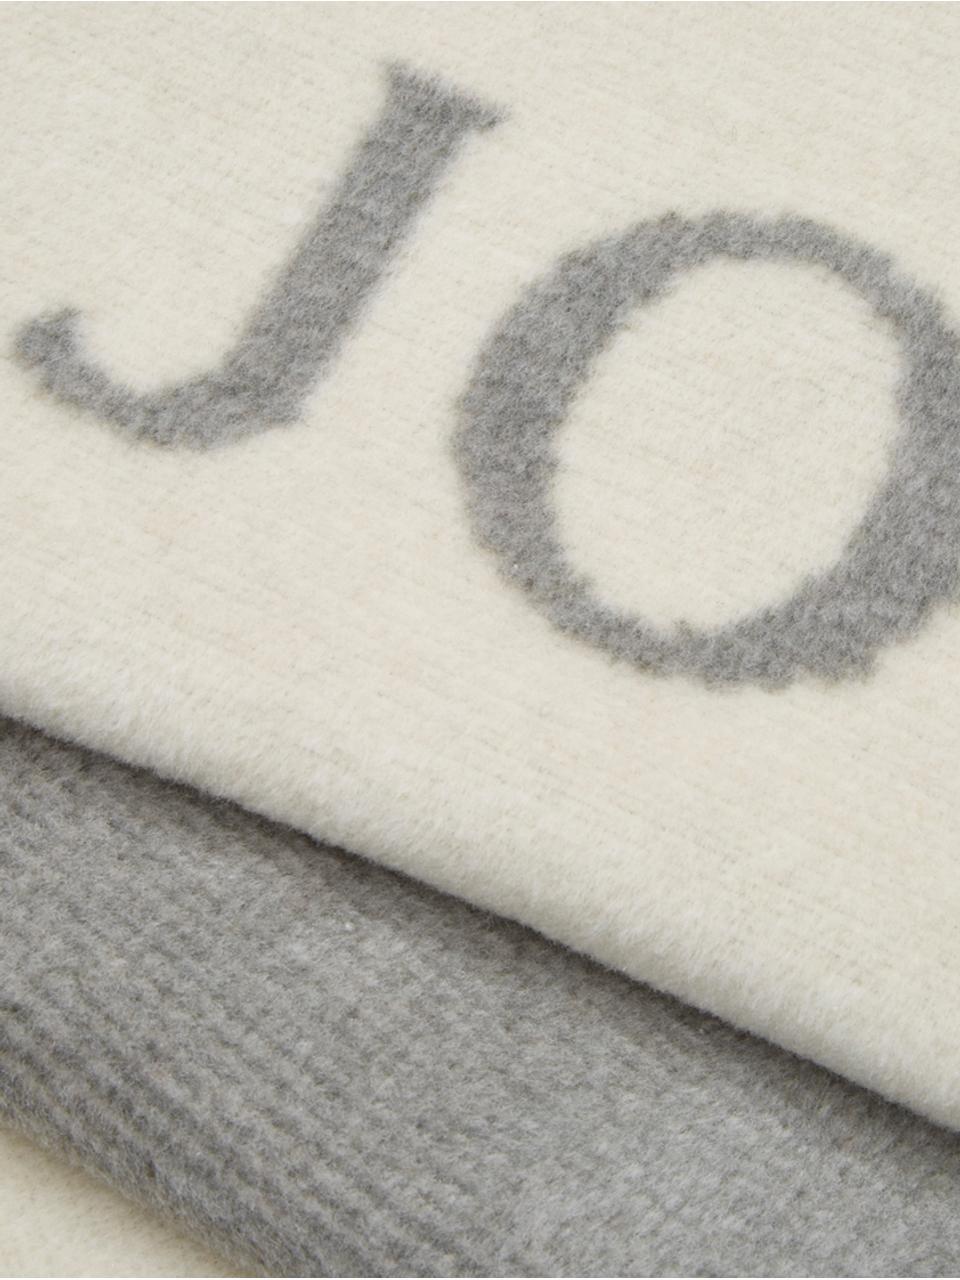 Coperta in morbido pile Melange Doubleface, 58% cotone, 35% poliacrilico, 7% poliestere, Bianco latteo, grigio, Larg. 150 x Lung. 200 cm